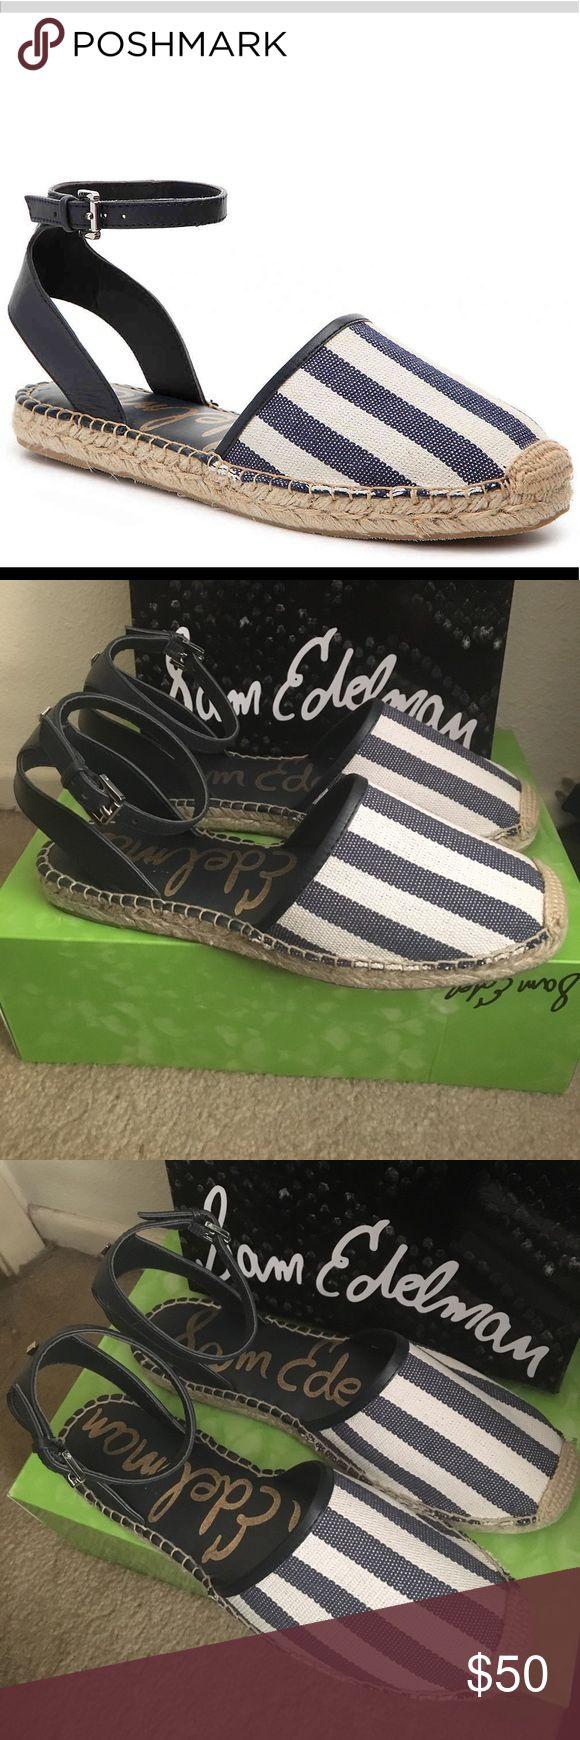 "Sam Edelman navy & white espadrilles sandals Blue and white striped canvas ""Vivian"" espadrille sandal shoes. Great gift! Brand new in box. Sam Edelman Shoes Espadrilles"